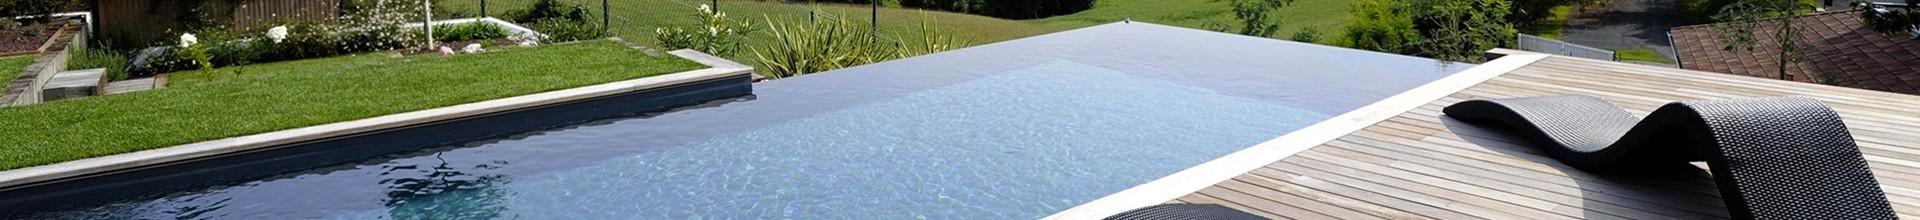 Direct usine, piscine coque prix Fribourg